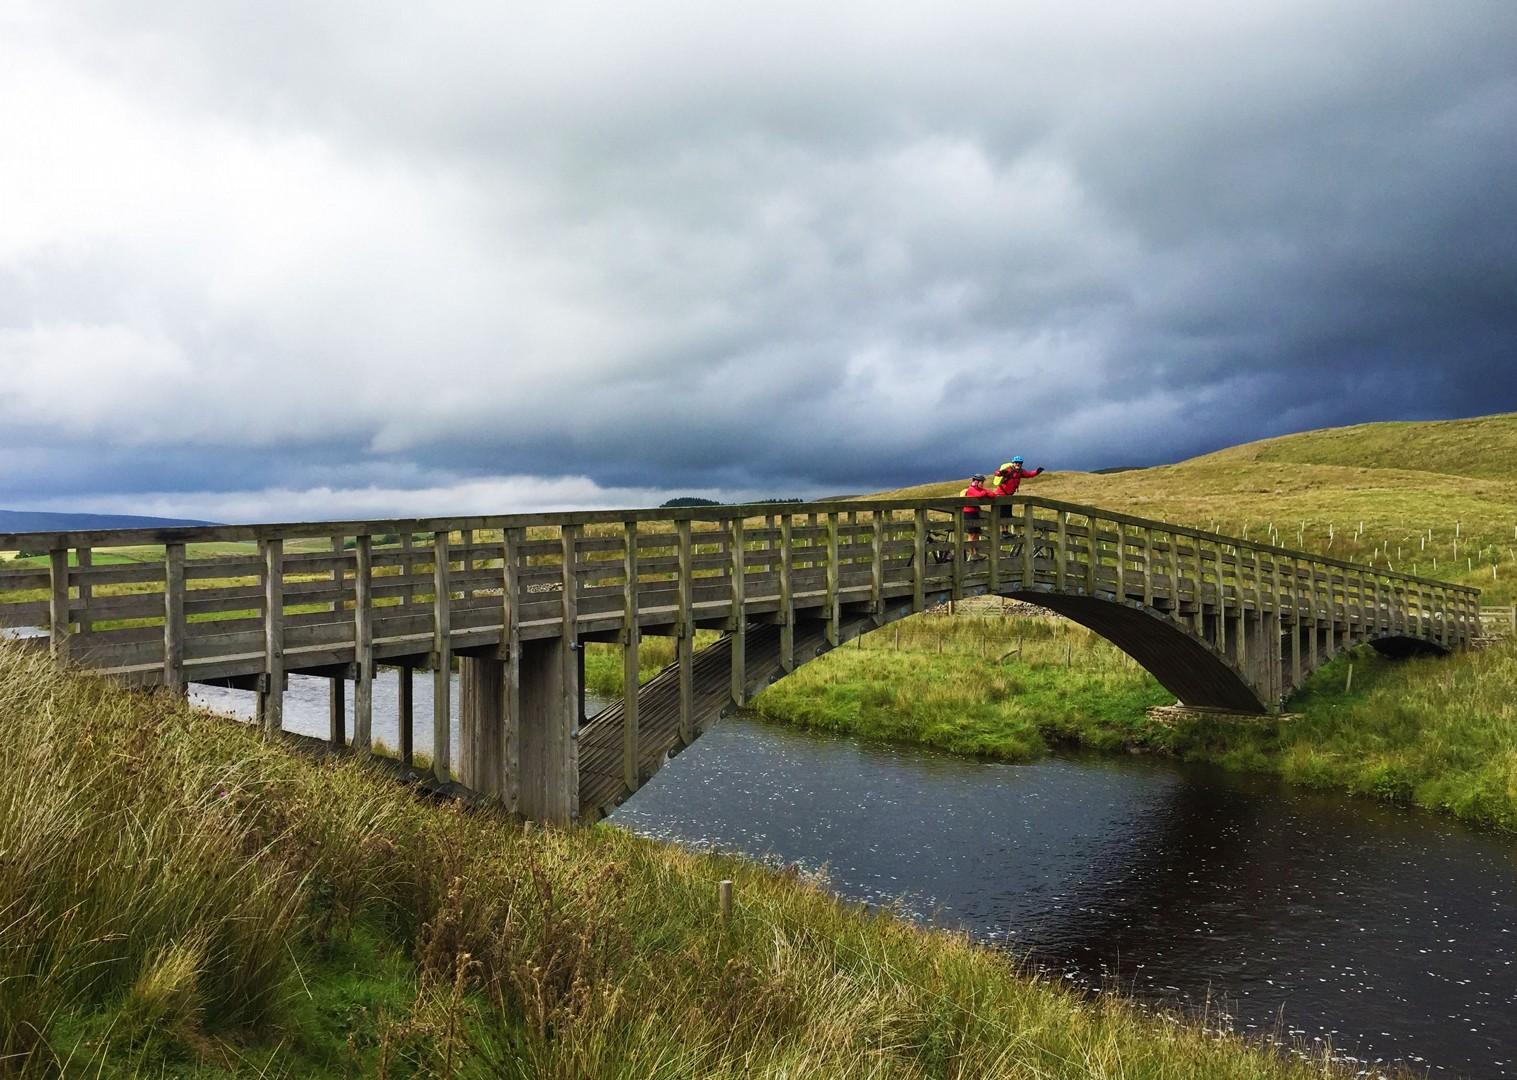 heritage-towns-settle-barnoldswick-hebden-bridge-mtb-uk.JPG - UK - Pennine Bridleway - Guided Mountain Bike Weekend - Mountain Biking